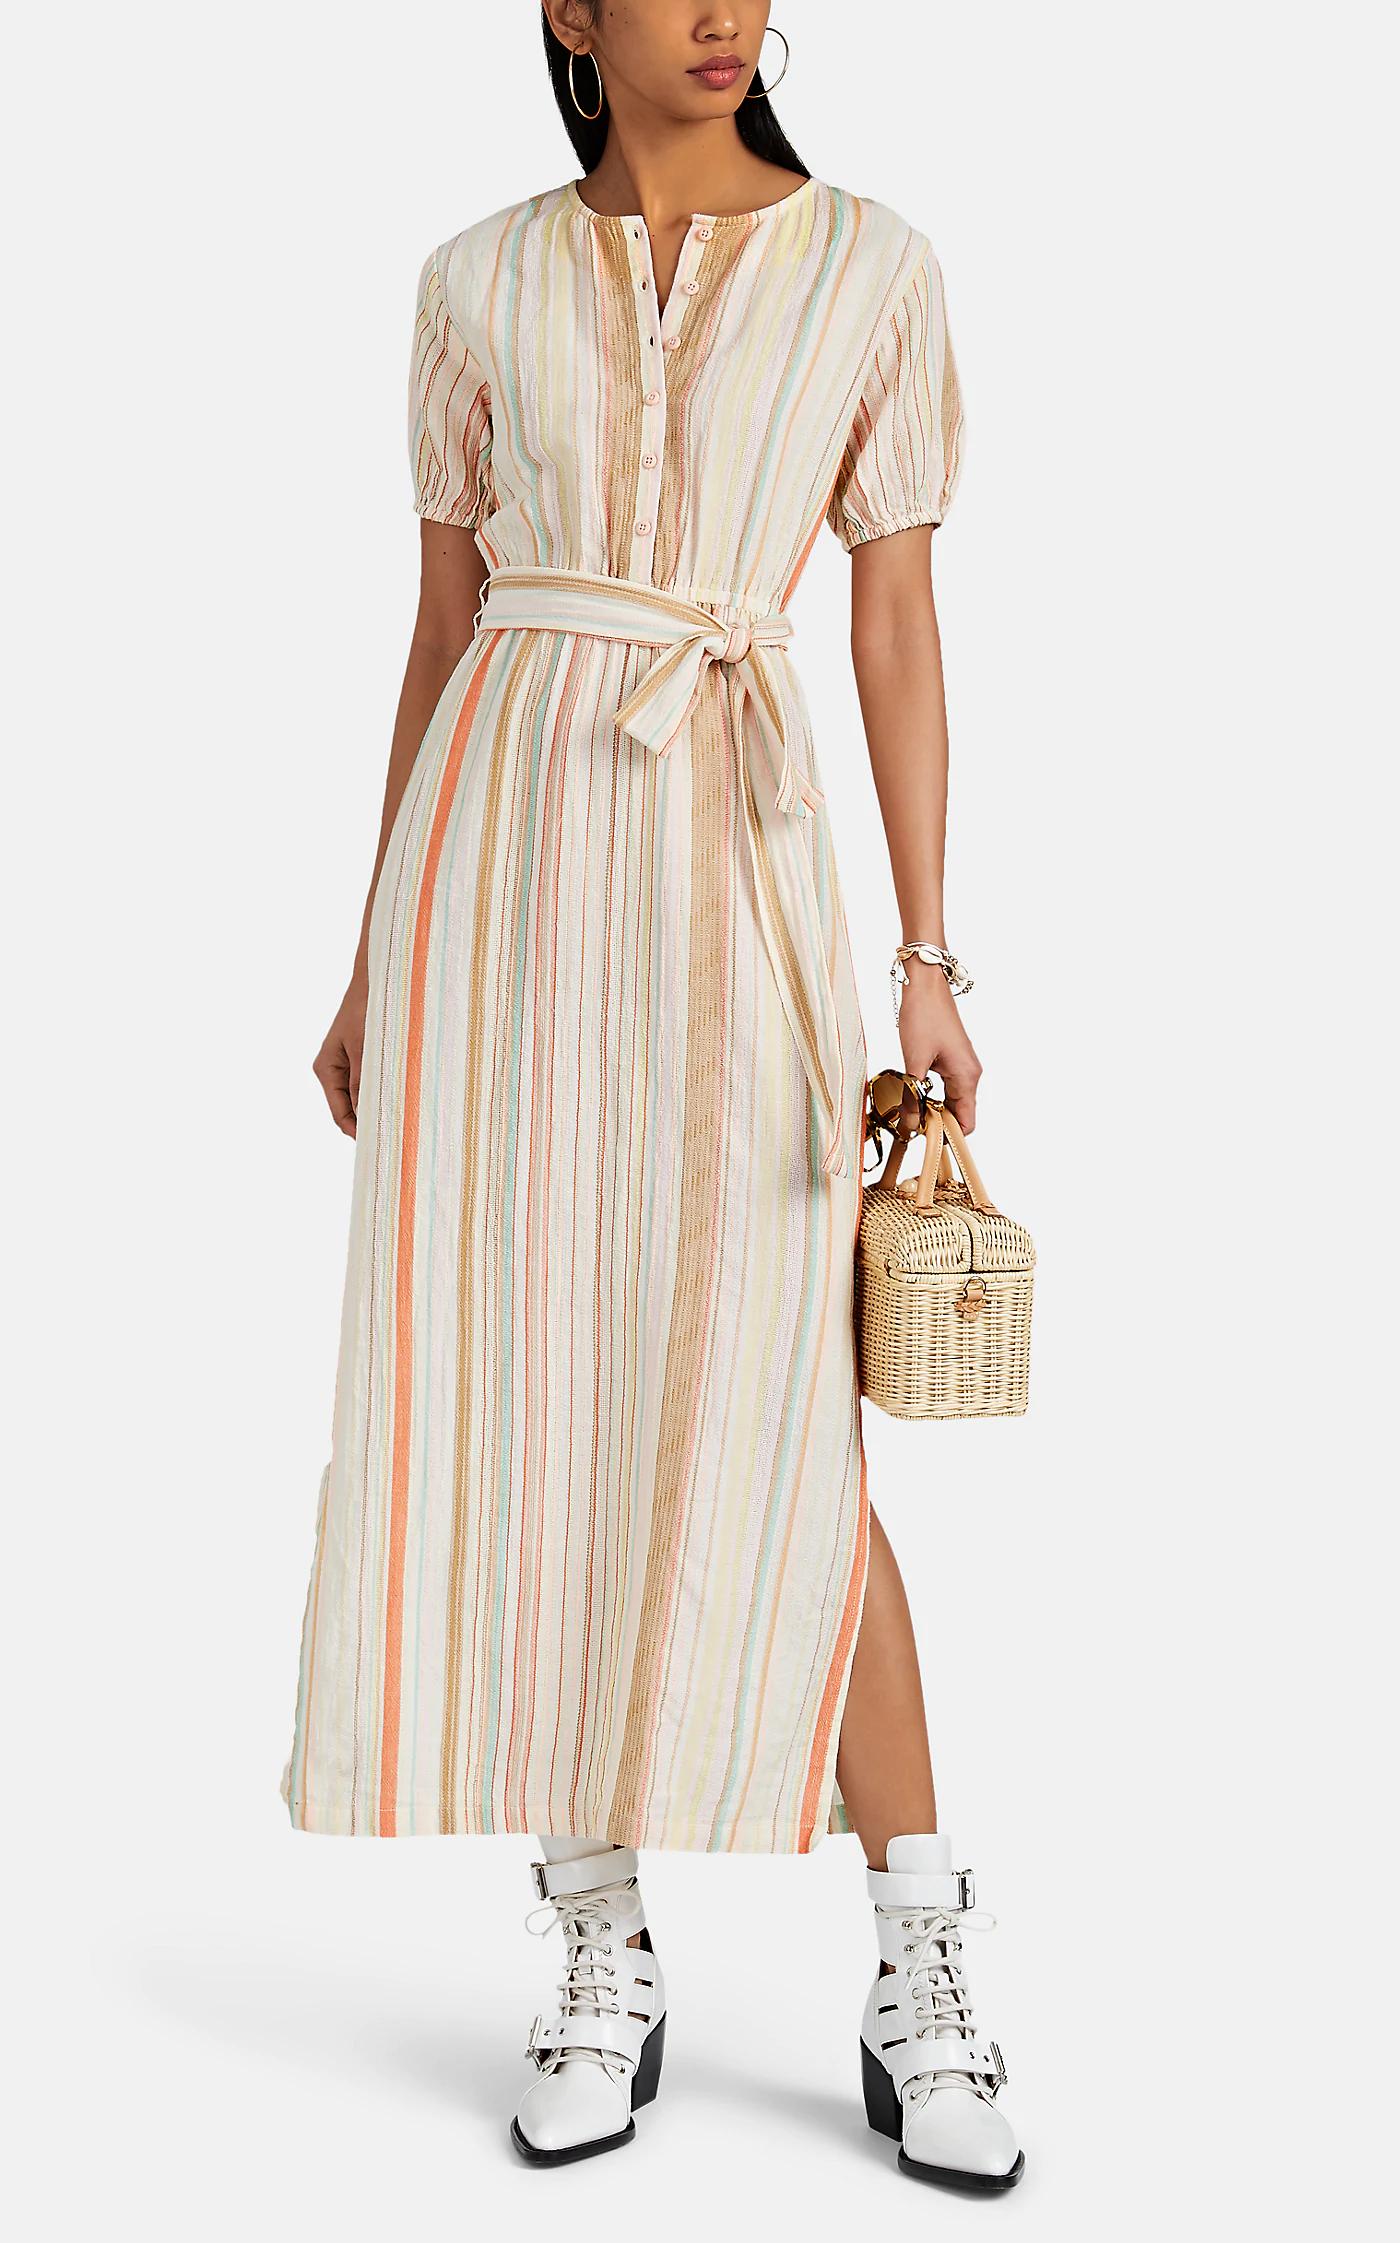 Ace Jig Georgie Striped Cotton Gauze Midi Dress Barneys New York Dresses Midi Dress Ace And Jig [ 2243 x 1400 Pixel ]